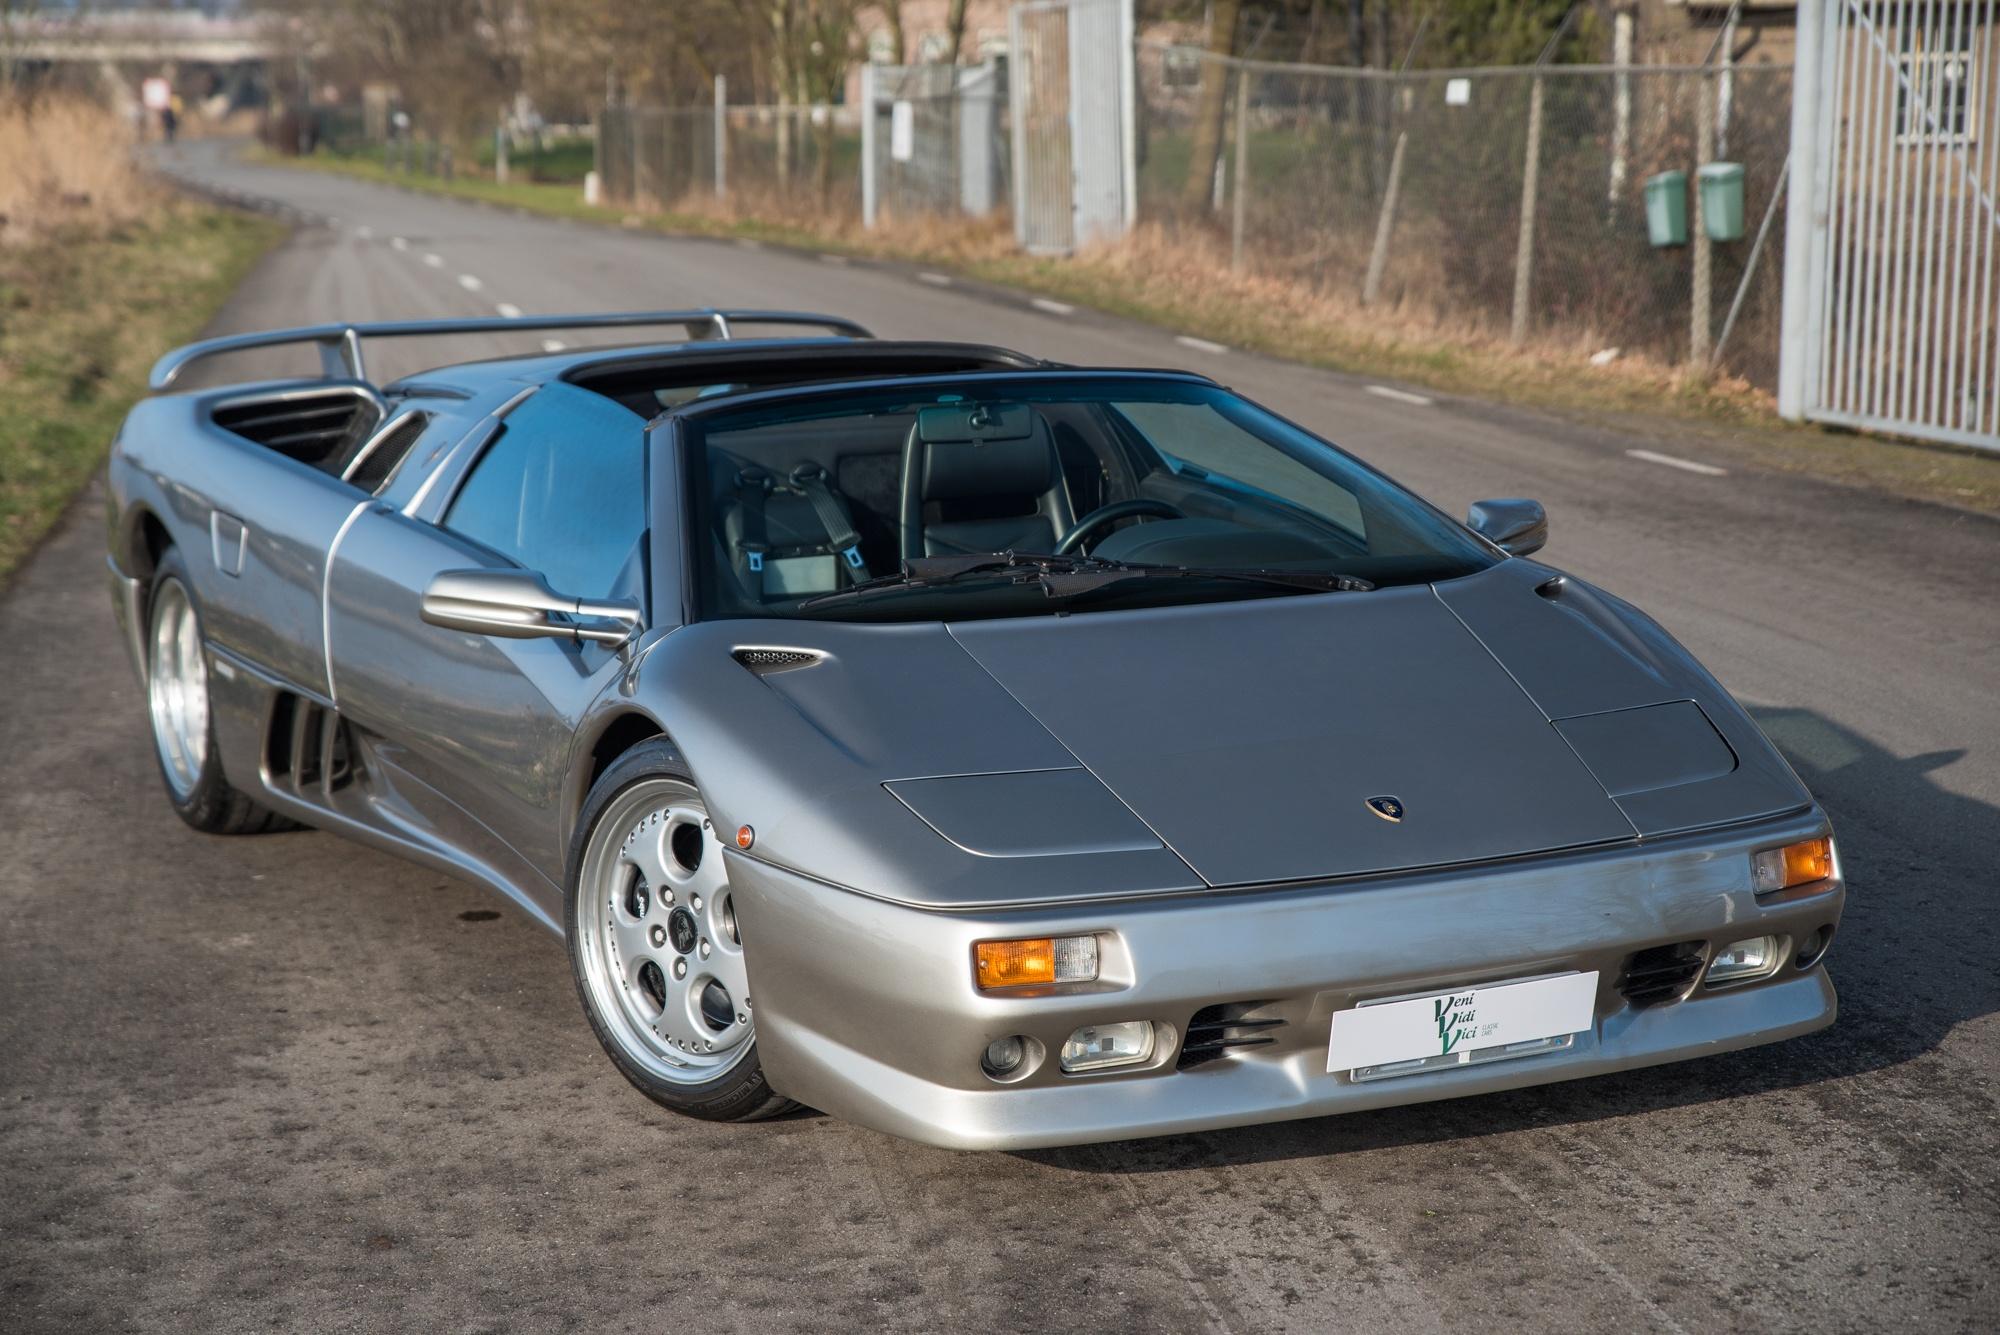 lamborghini_diablo_vt_roadster-5858 Mesmerizing Lamborghini Huracan Price In south Africa Cars Trend